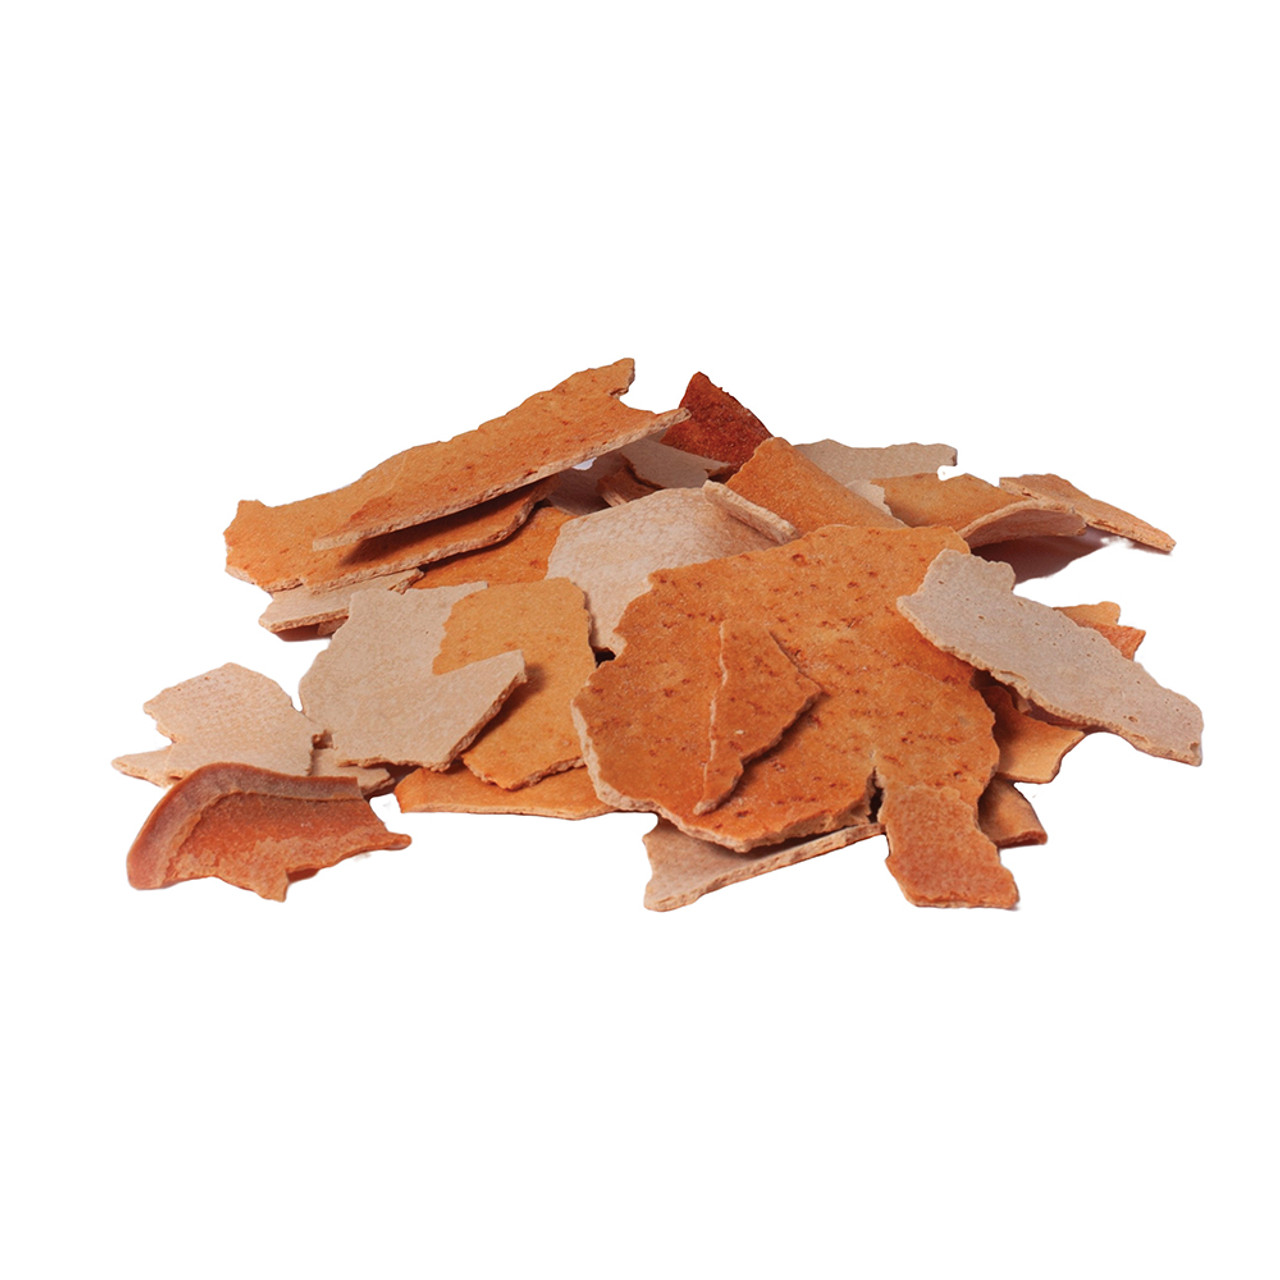 JustFoodForDogs Salmon Bark Dog Treats